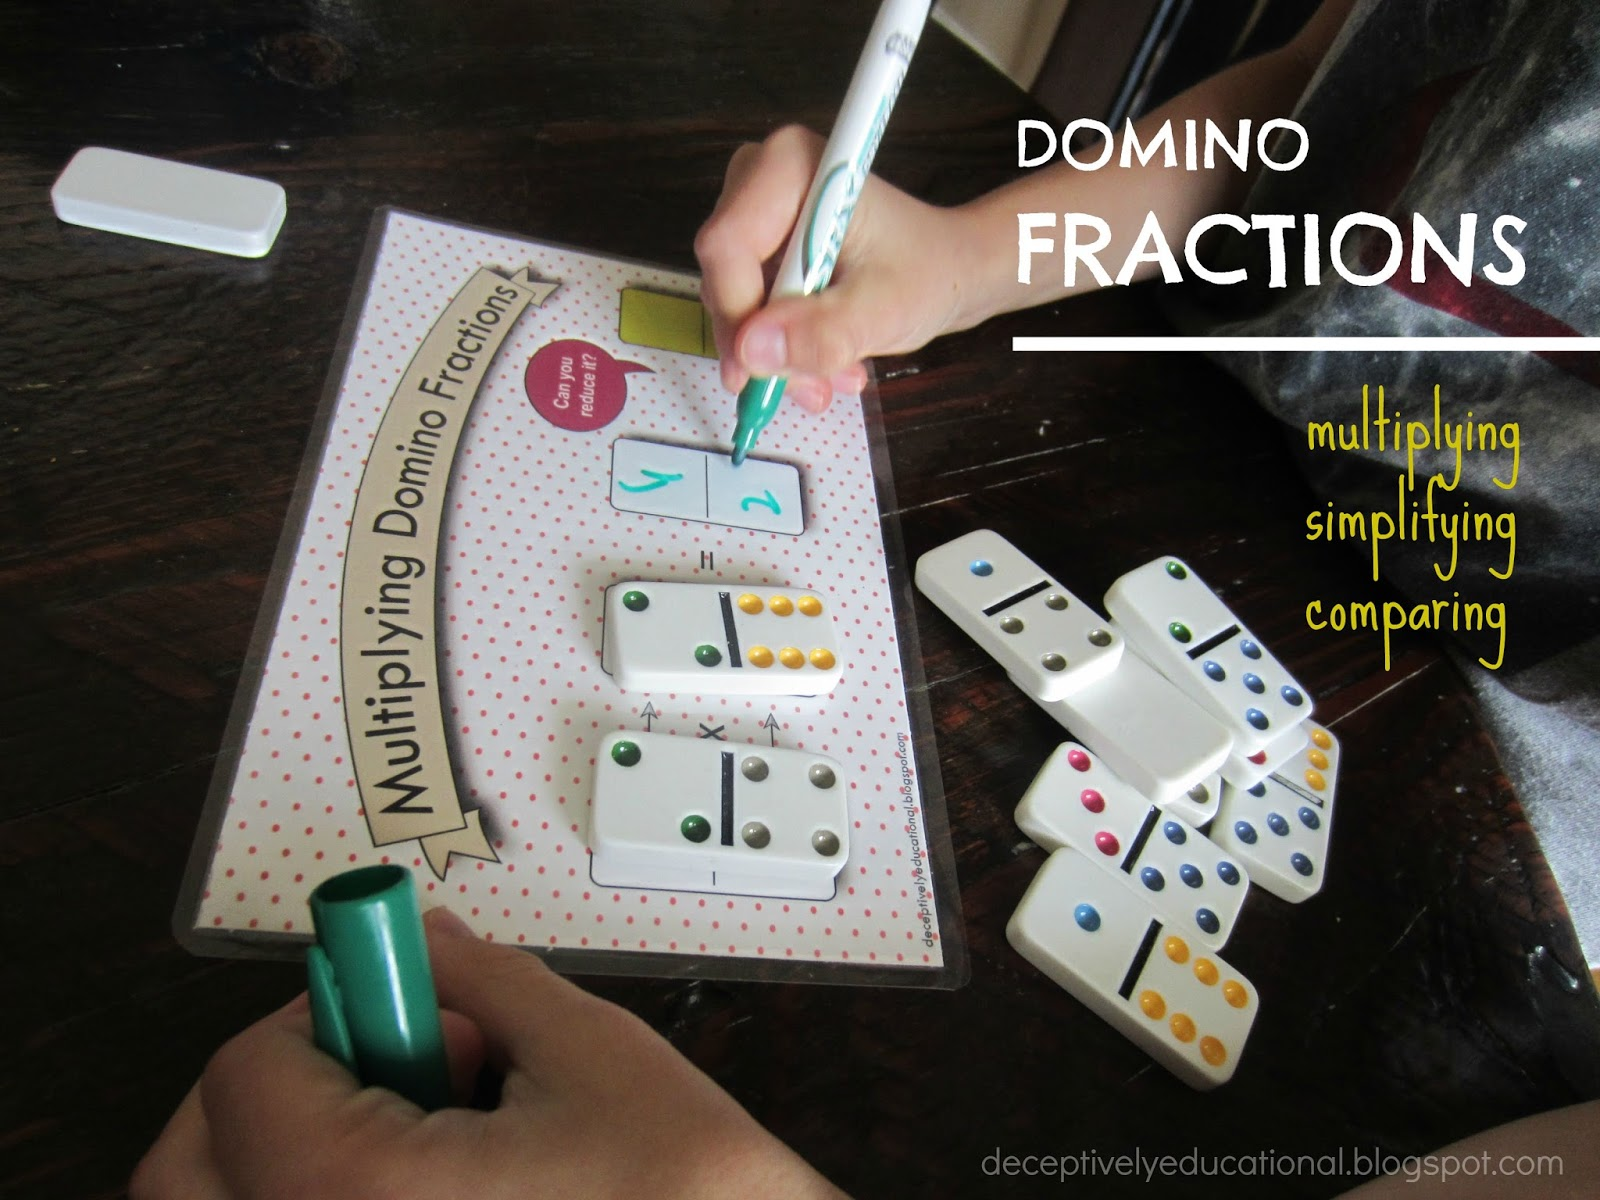 Multiplying Domino Fractions